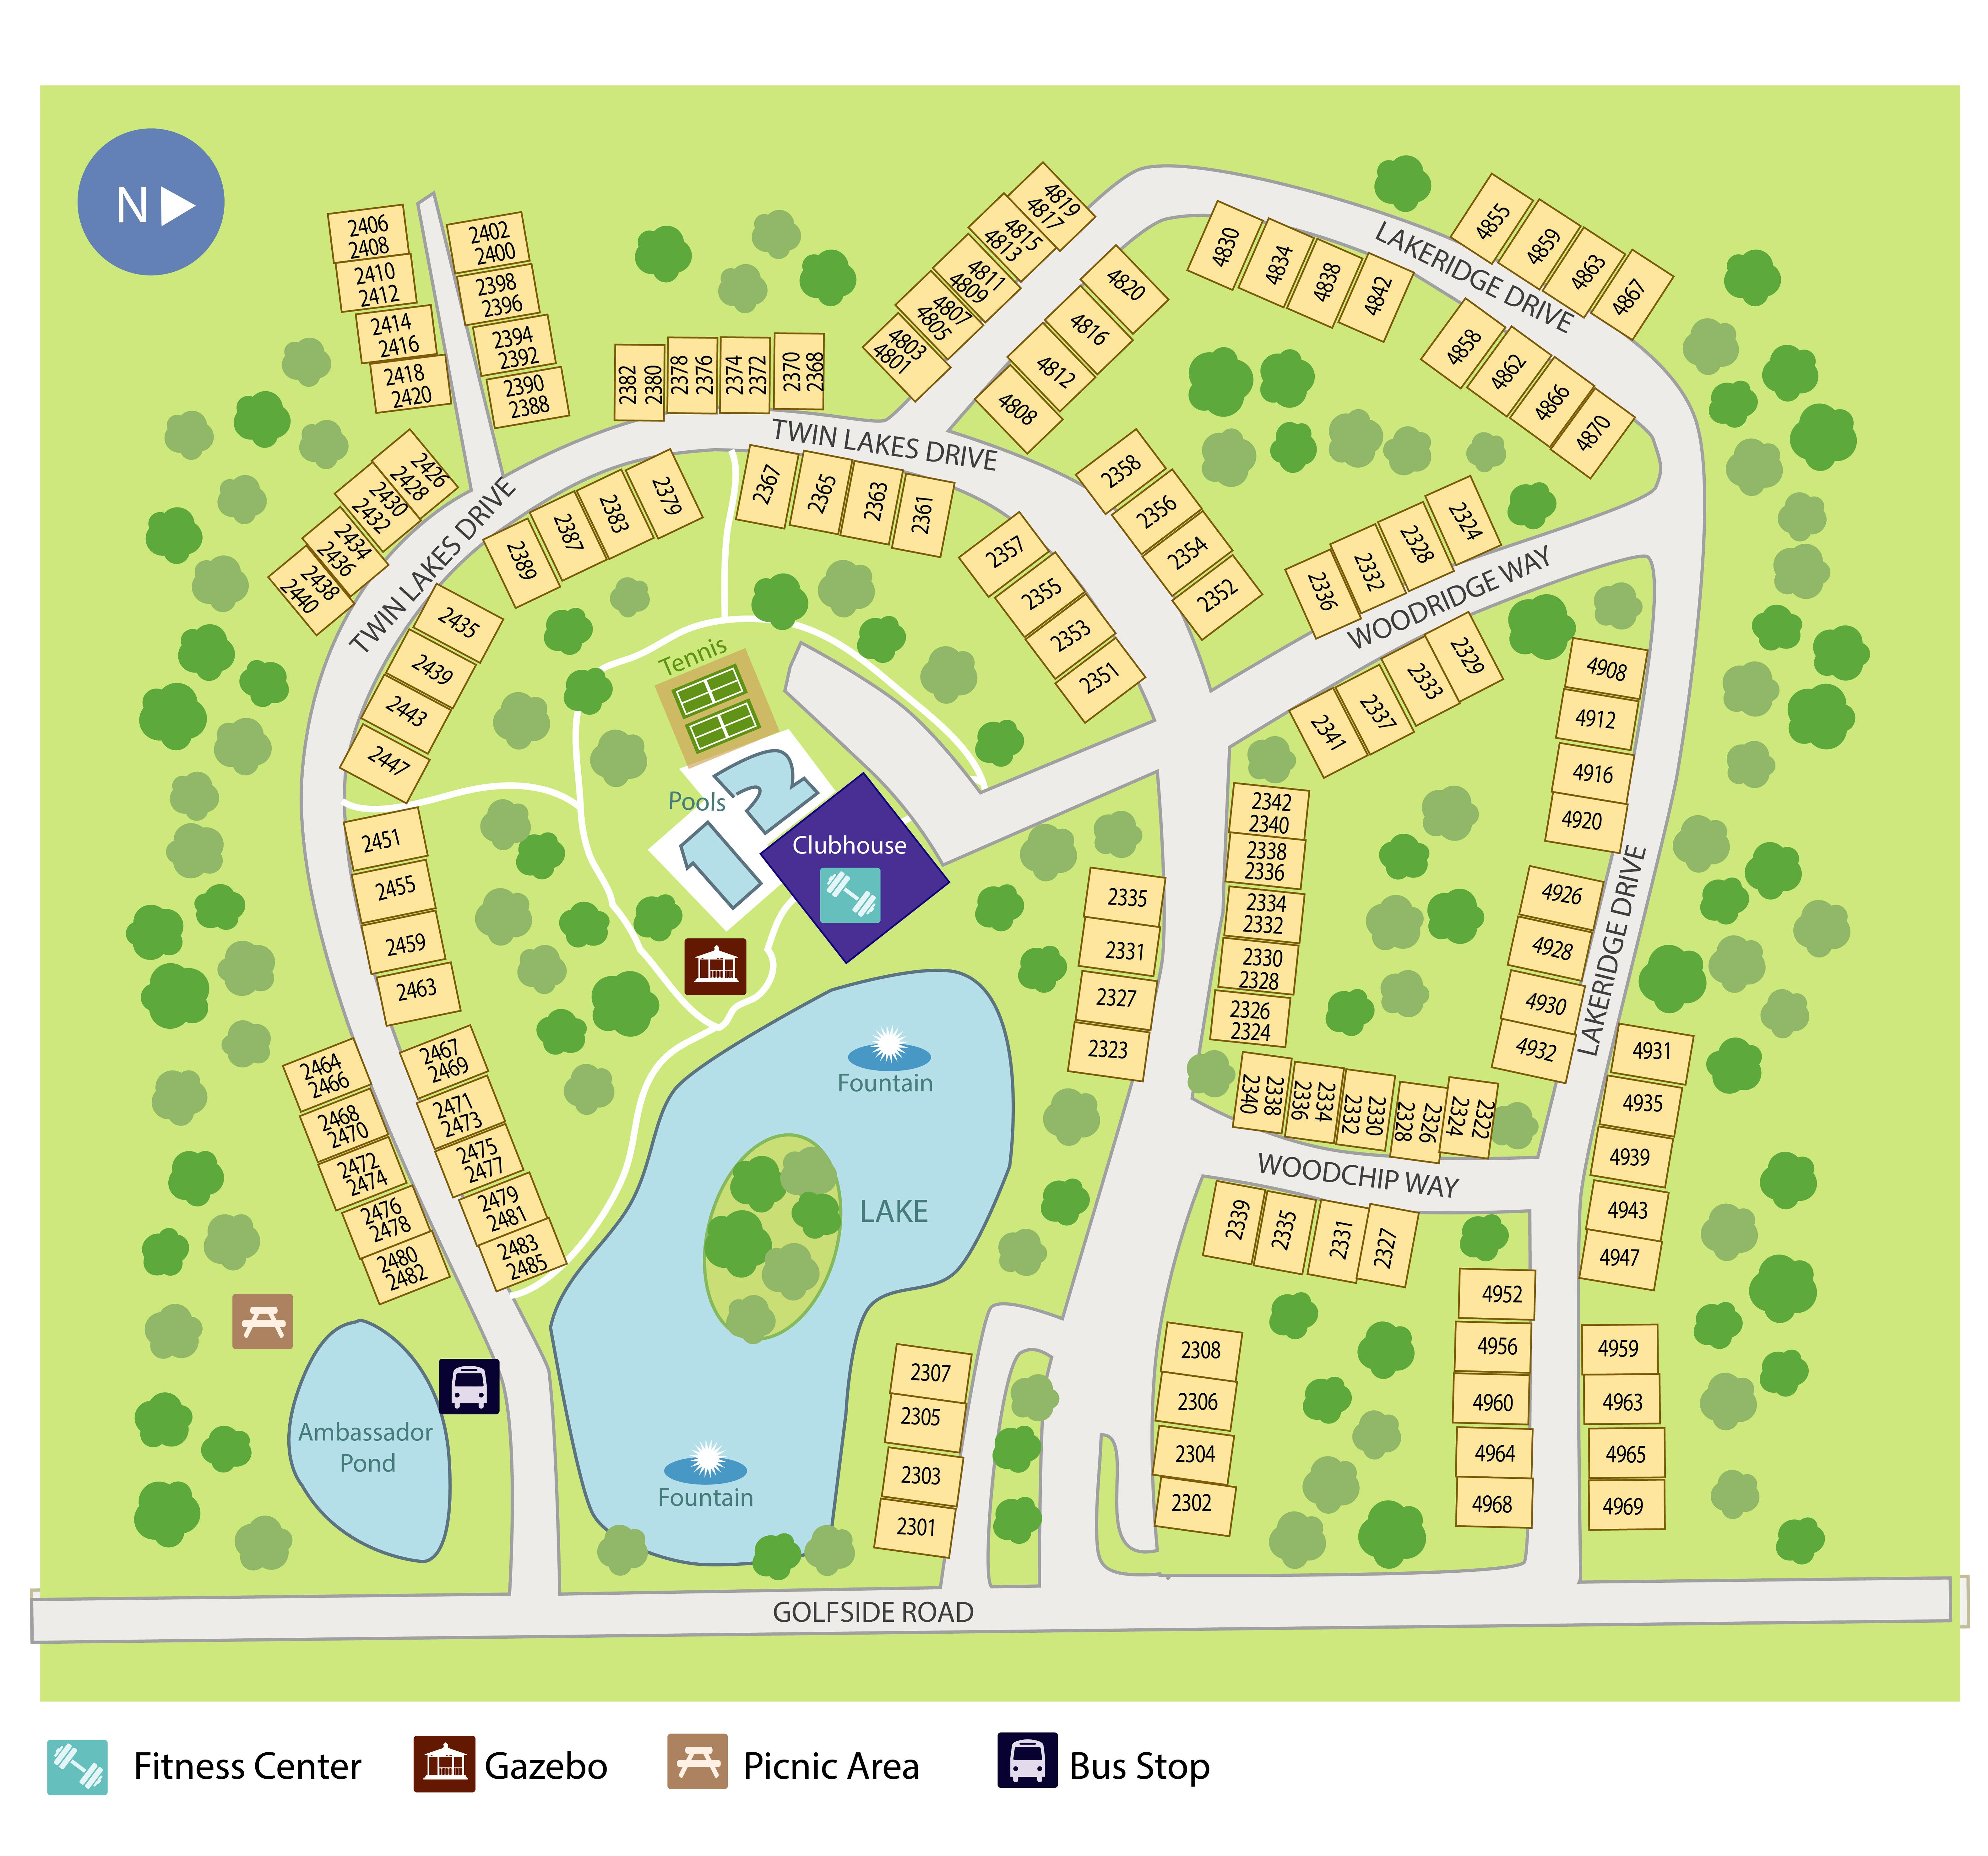 Huron View Apartments In Ypsilanti Michigan: Golfside Lake Apartments